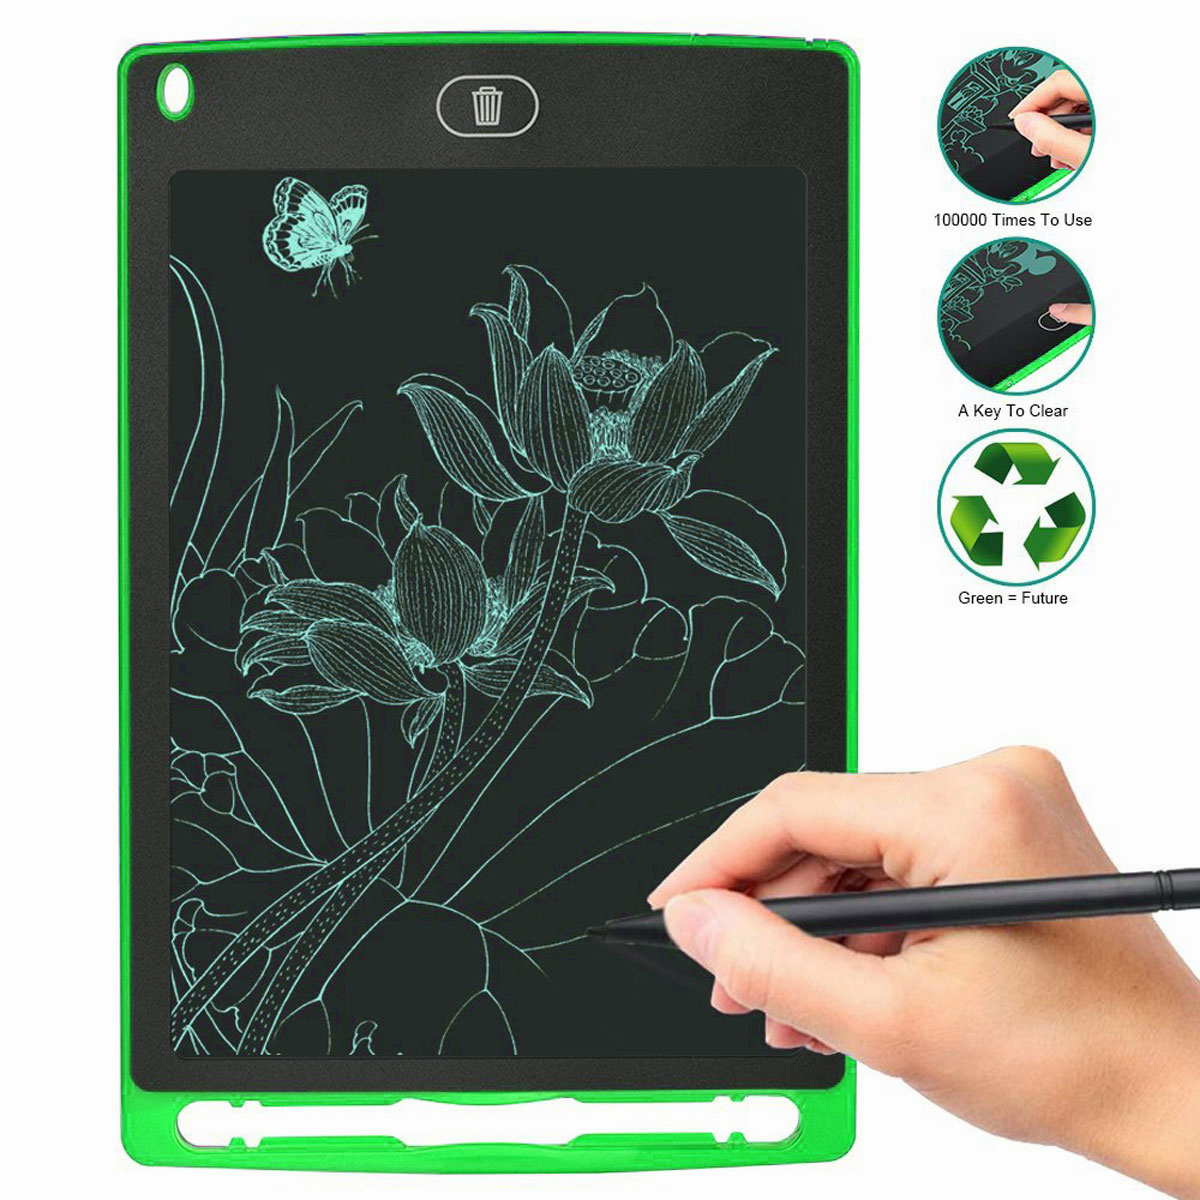 8-5-034-Digital-Electronic-LCD-Writing-Tablet-Drawing-Pad-eWriter-Board-For-Kids thumbnail 28